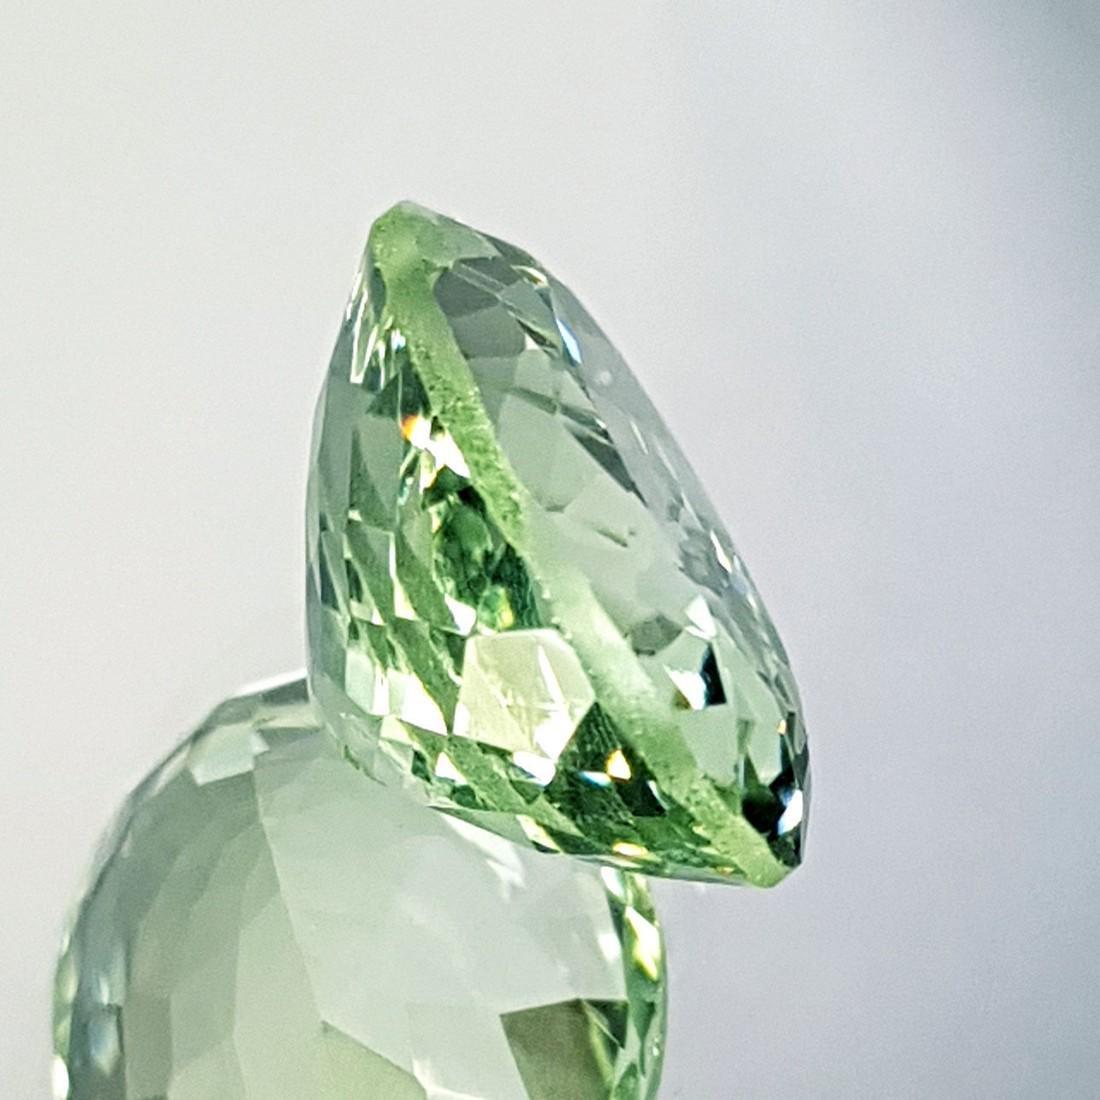 Lovely Gem Natural Green Amethyst - 10.81 ct - 2